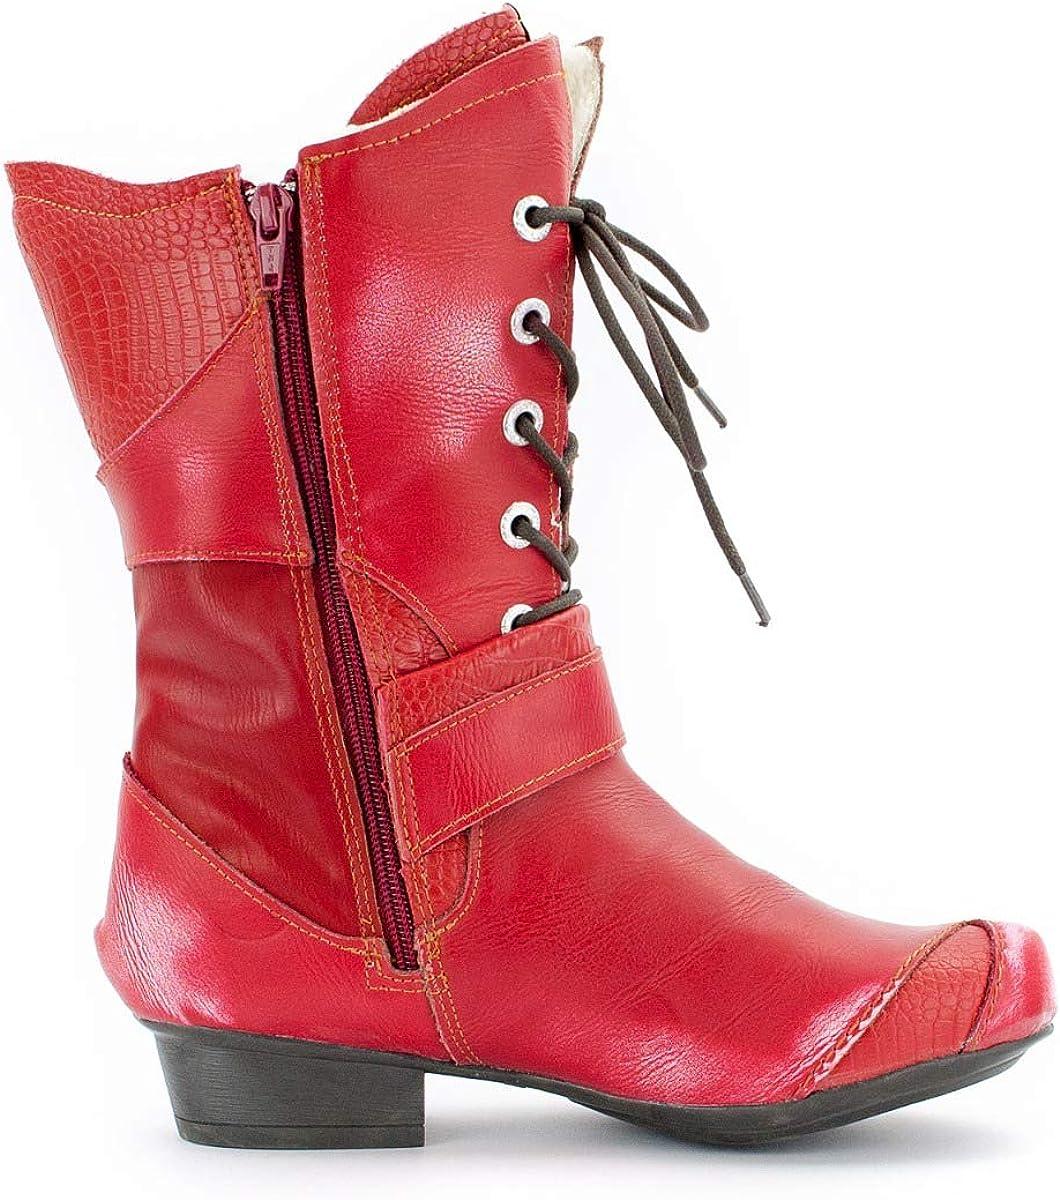 TMA Bizarre 8166 Scarpe Donna, Pelle, Colori Multipli, Taglie 36-42 EU Rosso